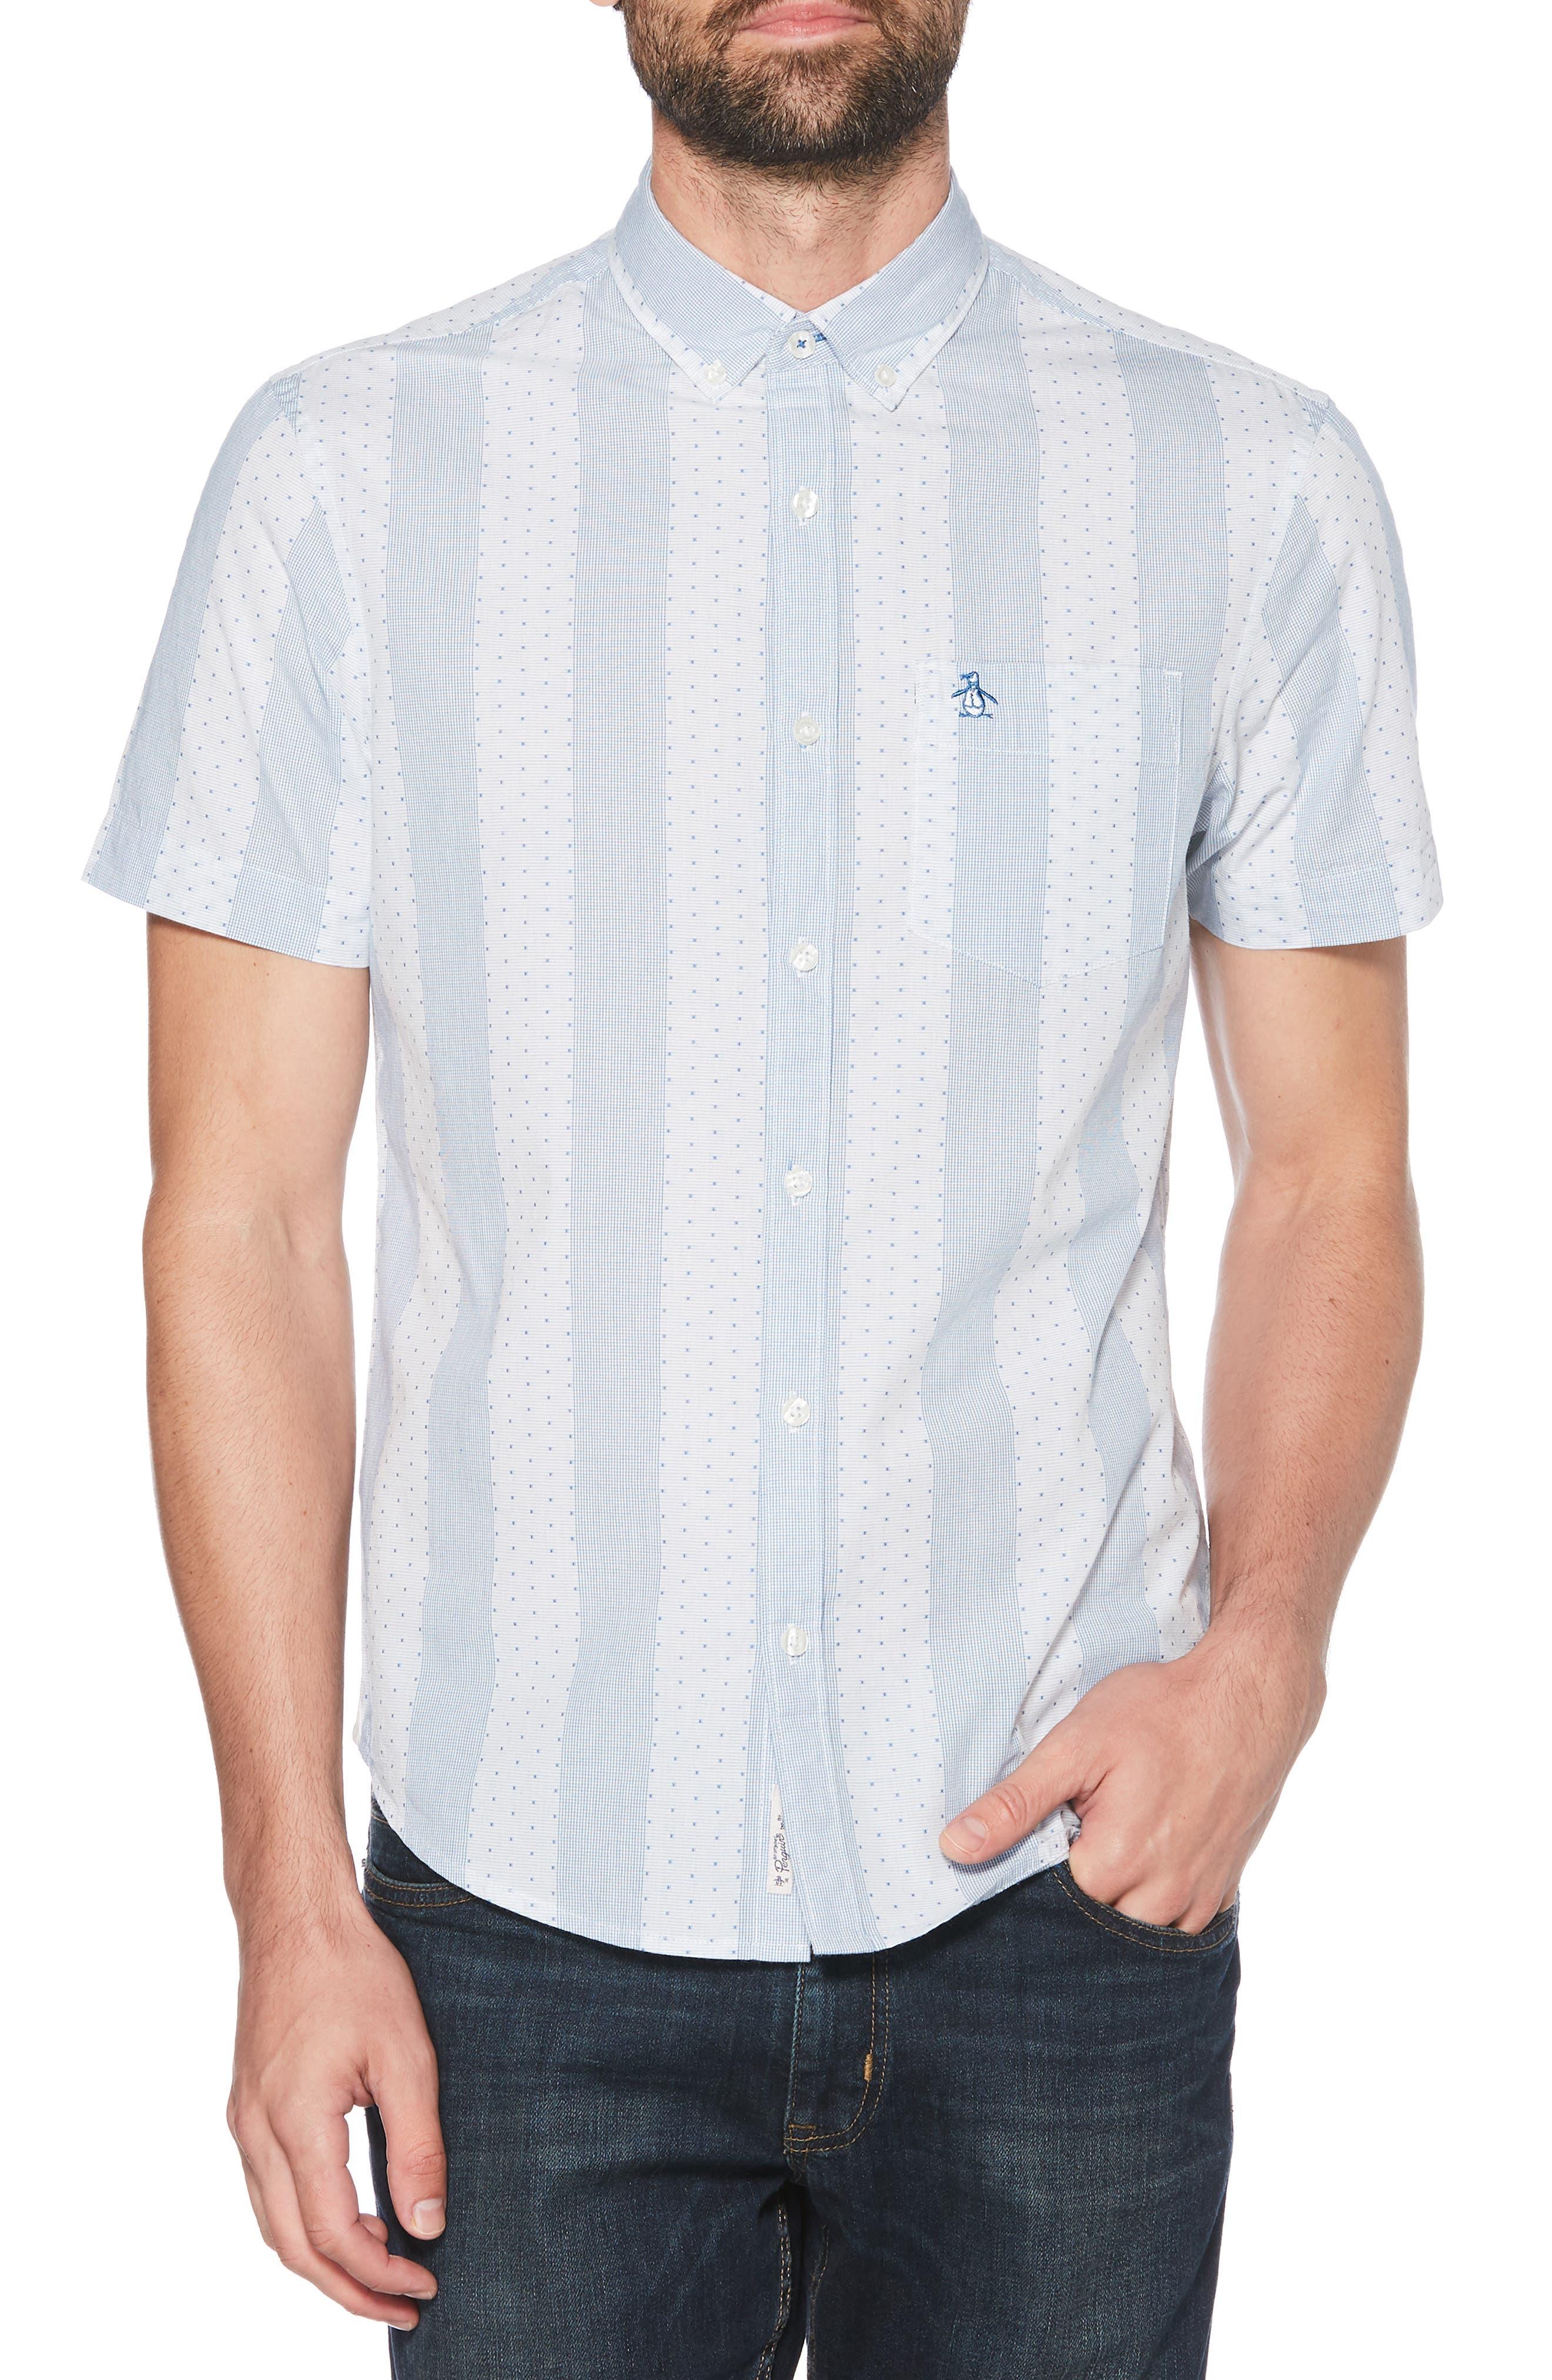 ORIGINAL PENGUIN Square Dobby Stripe Shirt, Main, color, BRIGHT WHITE